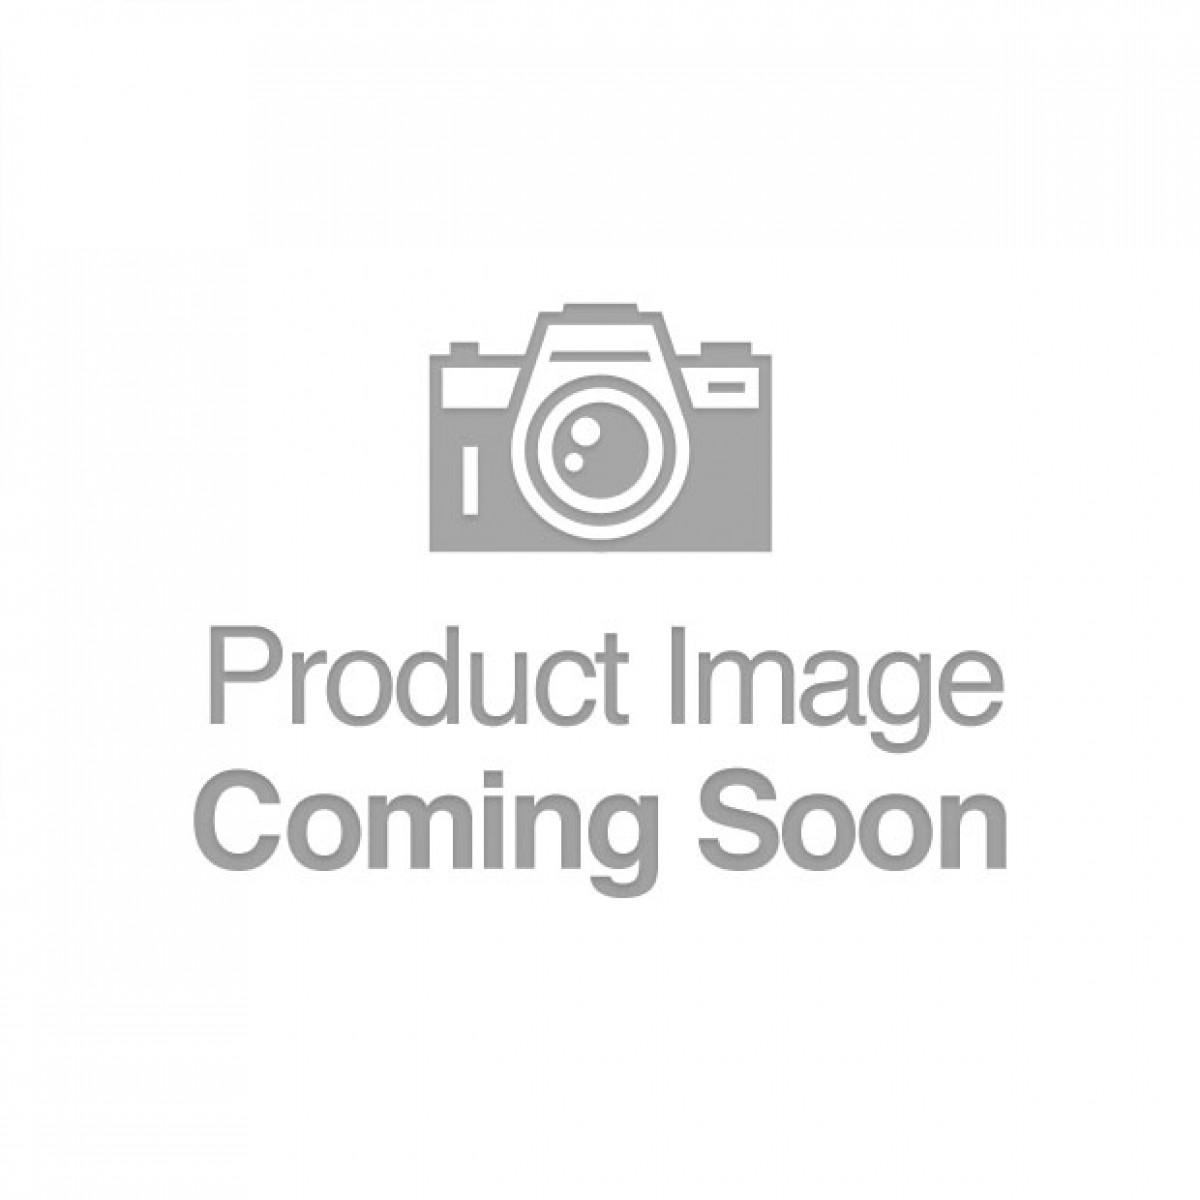 "Xplay Gear Ultra Soft Gear Bag 8"" x 13"" - Cotton"